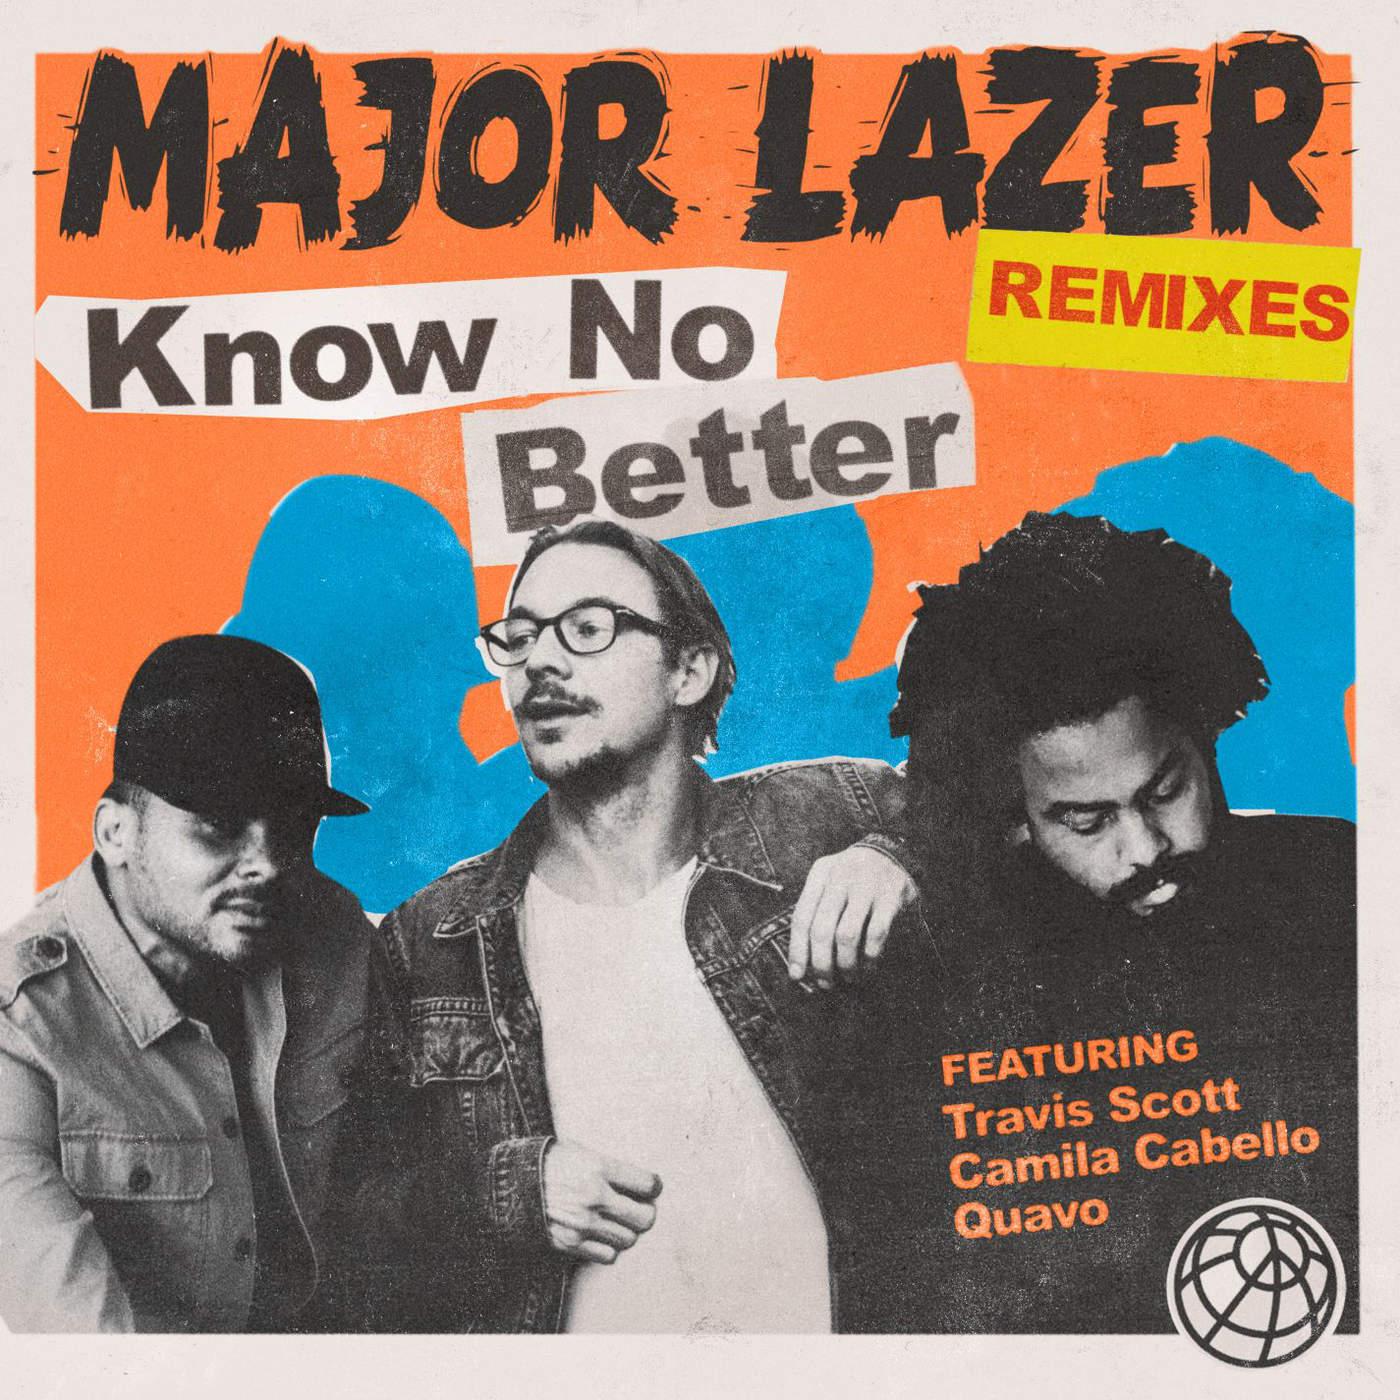 Major Lazer - Know No Better (feat. Travis Scott, Camila Cabello & Quavo) [Remixes]